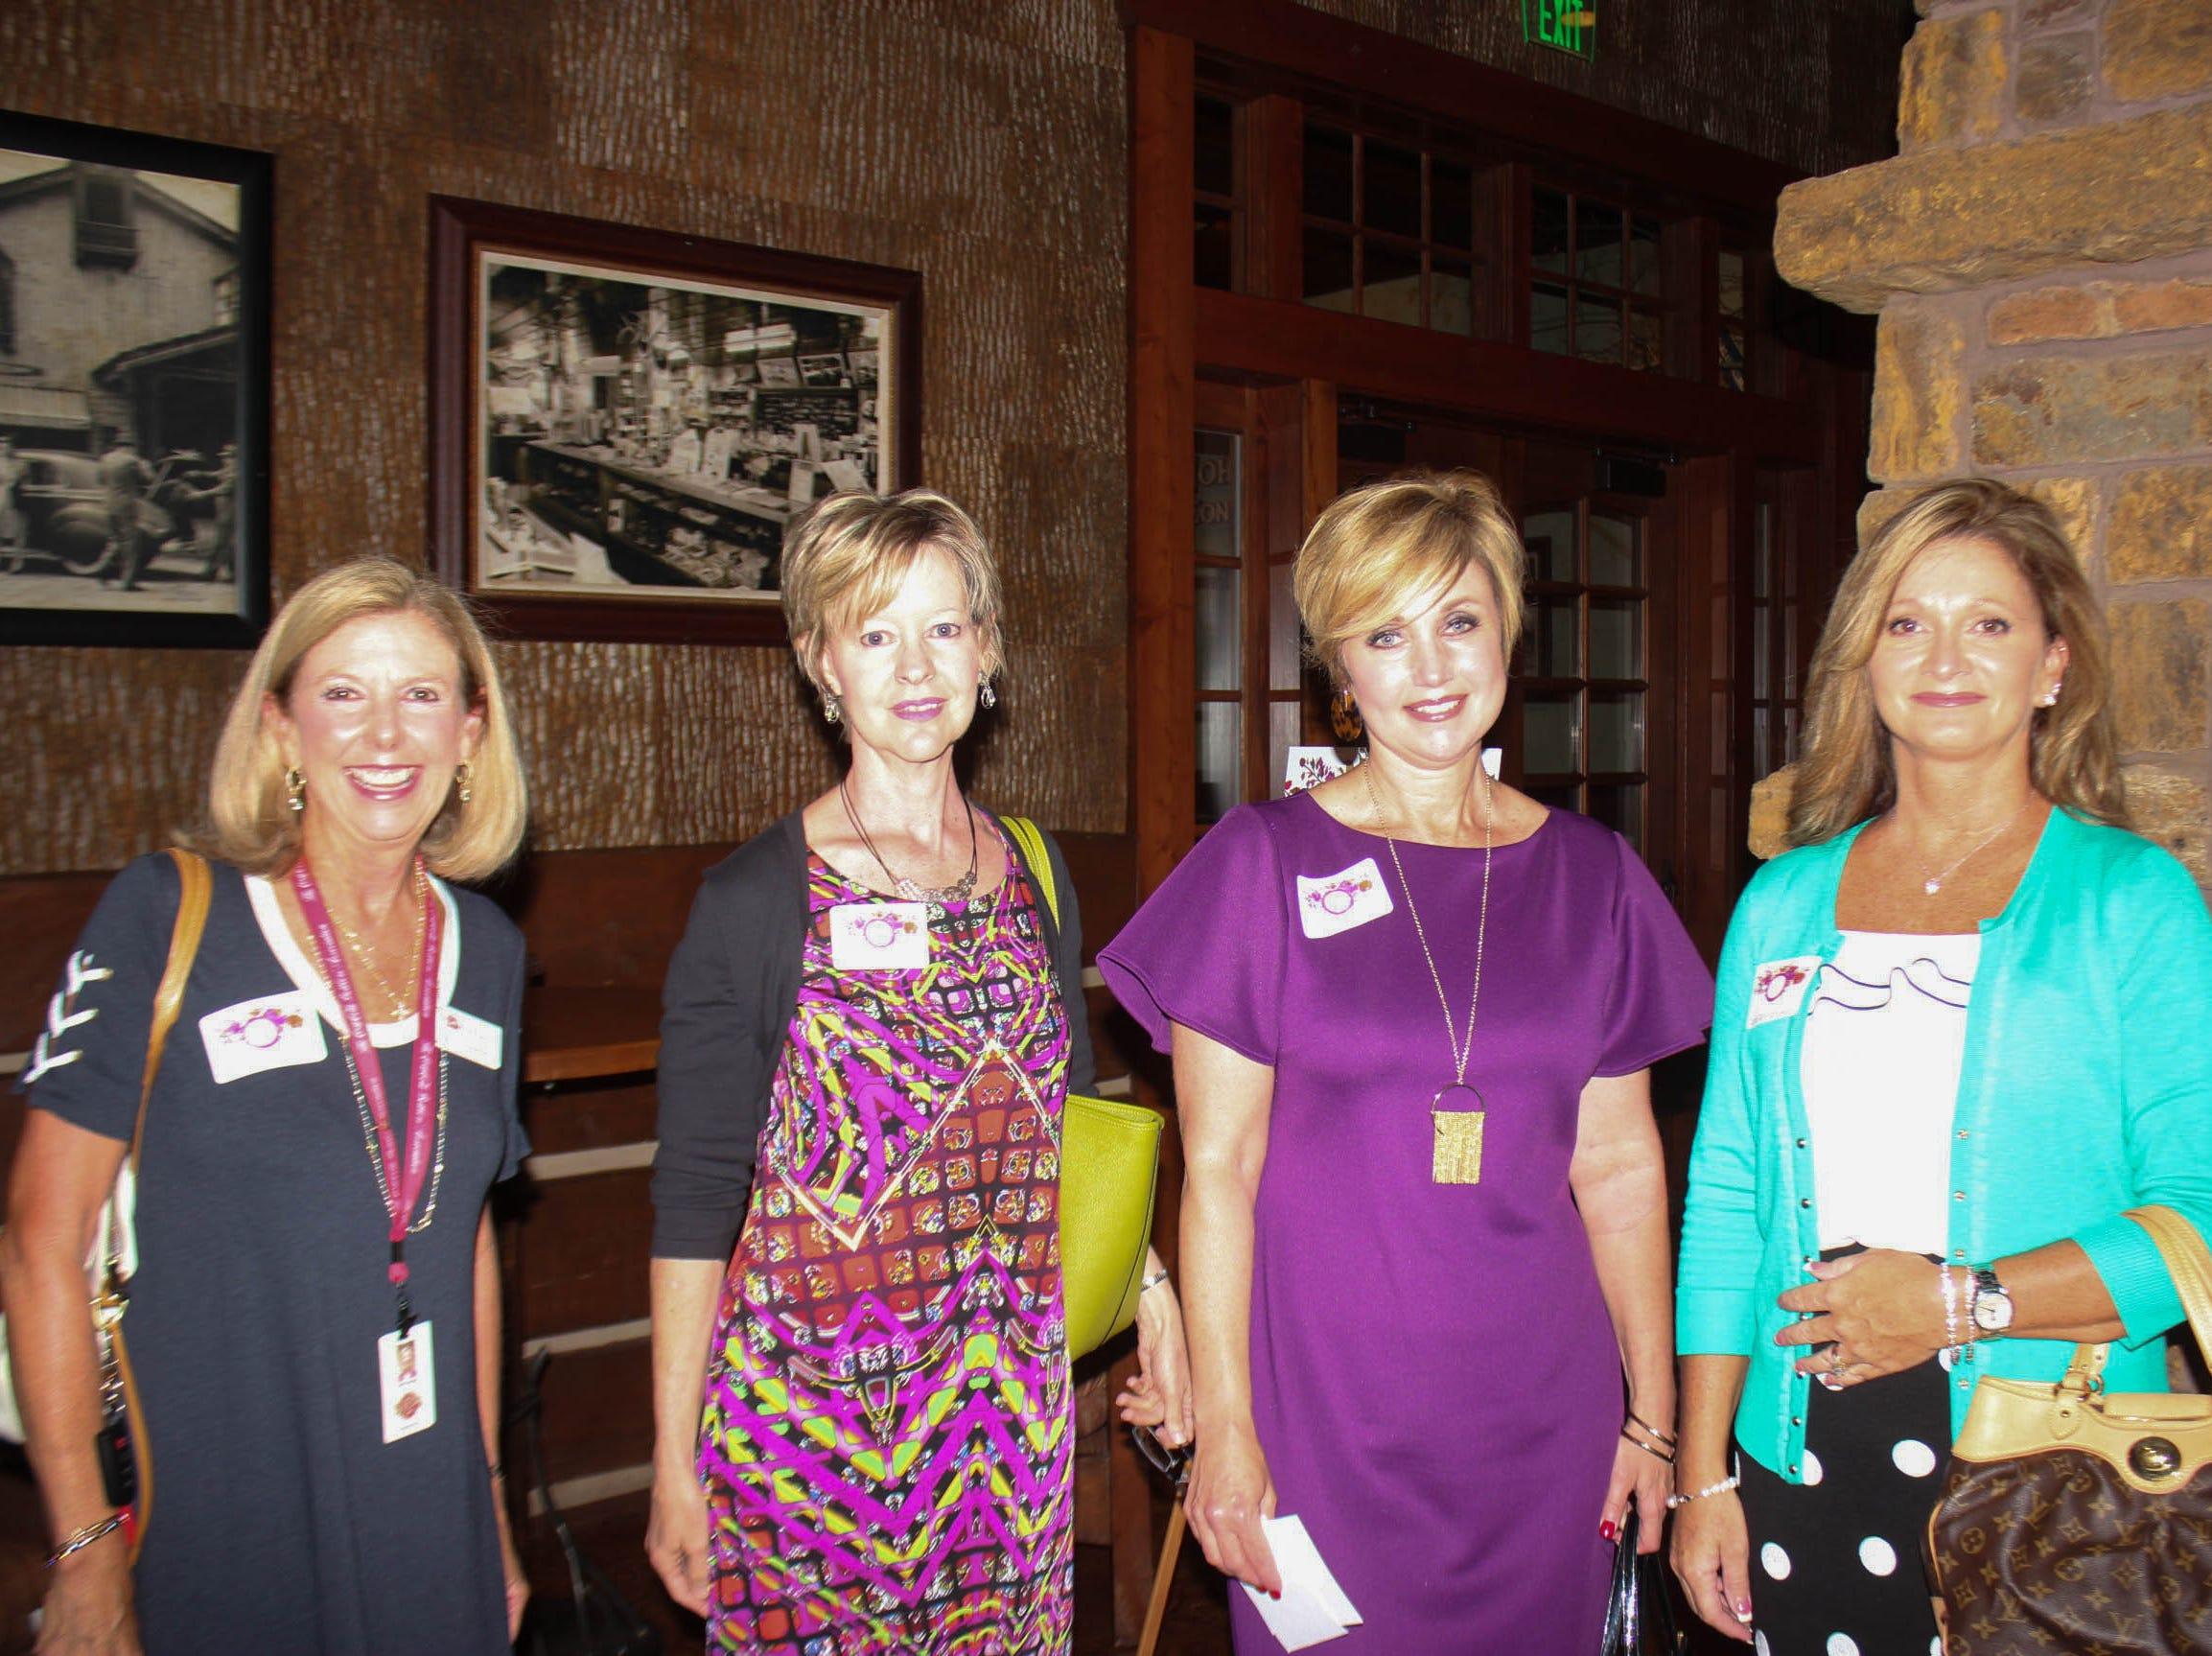 Sally Hargis, Ann Marie Baker, Shelly Addinston, and Lori Wanamaker